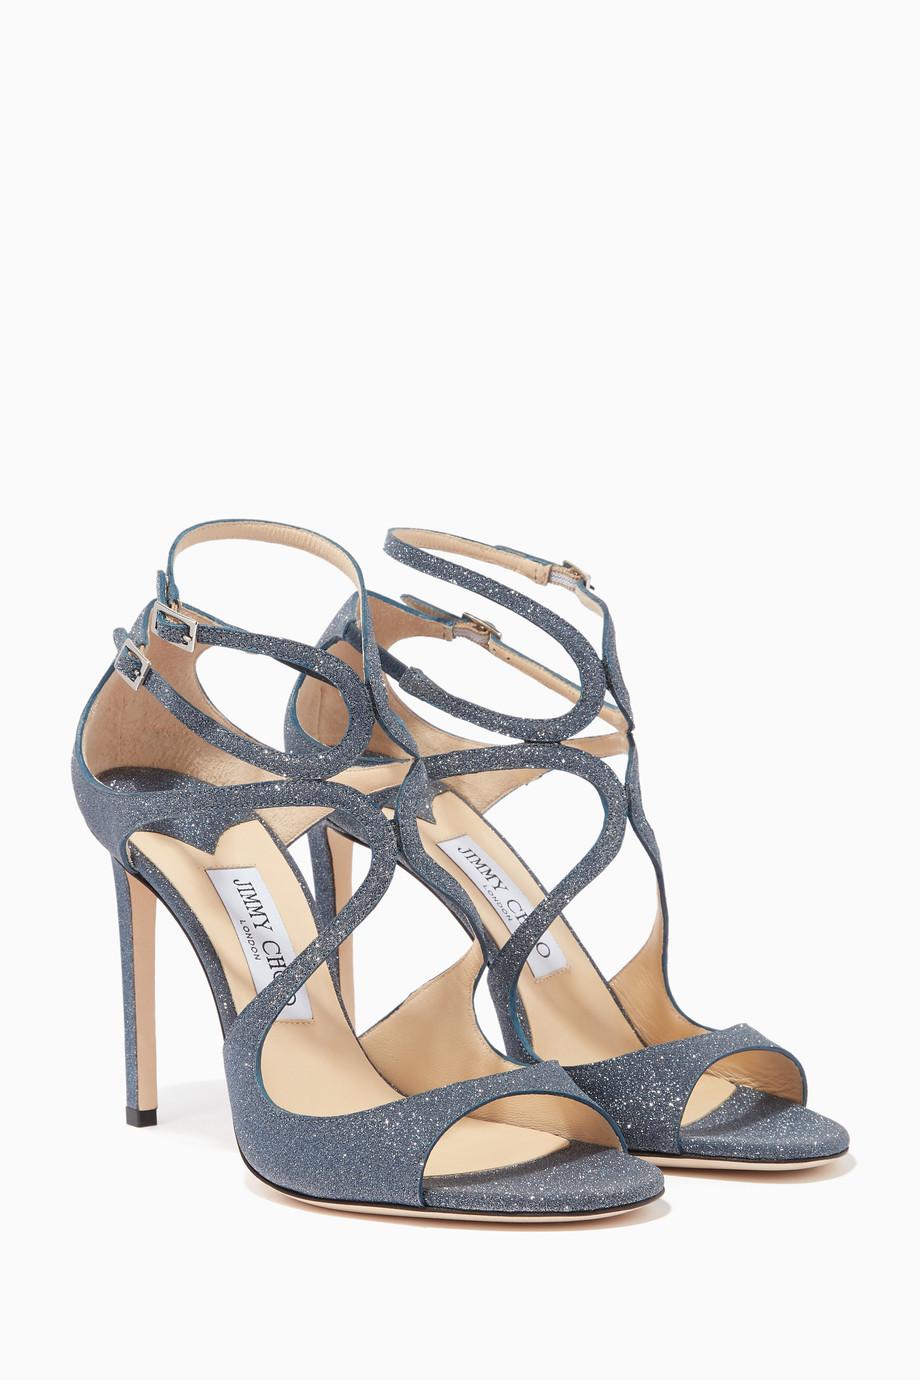 64747fc6dd4 Shop Jimmy Choo Blue Navy Lang 100 Sandals for Women